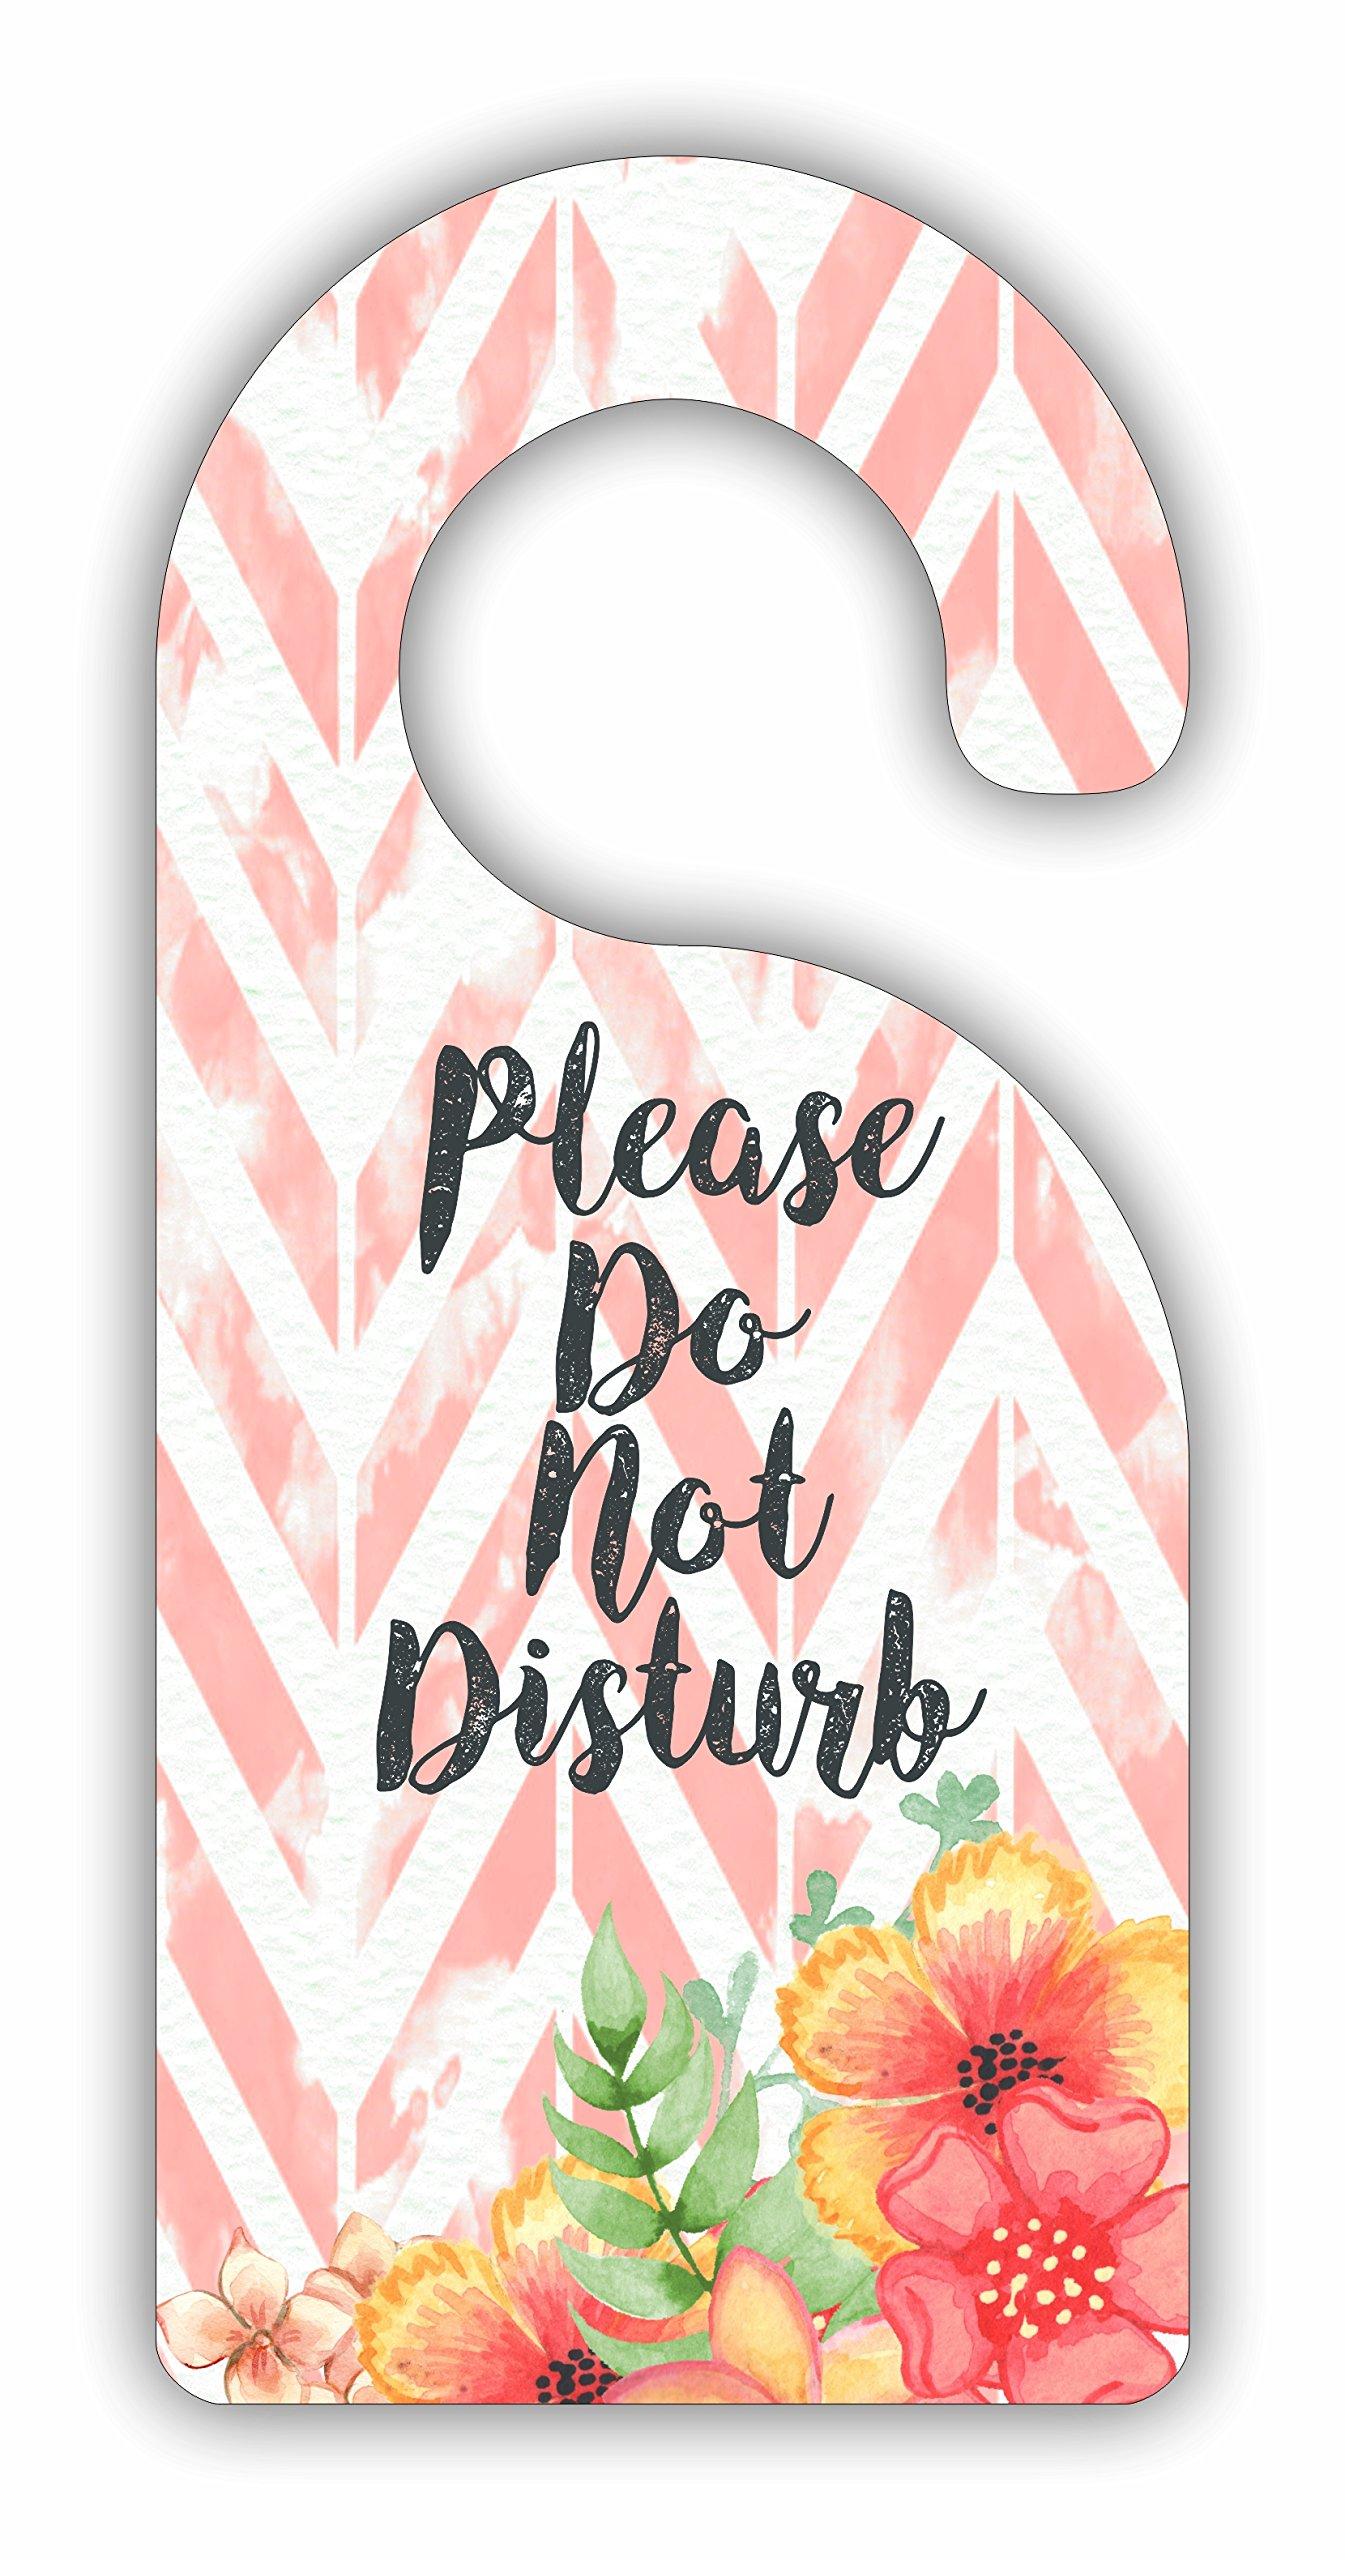 Please Do Not Disturb - Flowers on Pink Chevrons - Room Door Sign Hanger - Hardboard - Glossy Finish